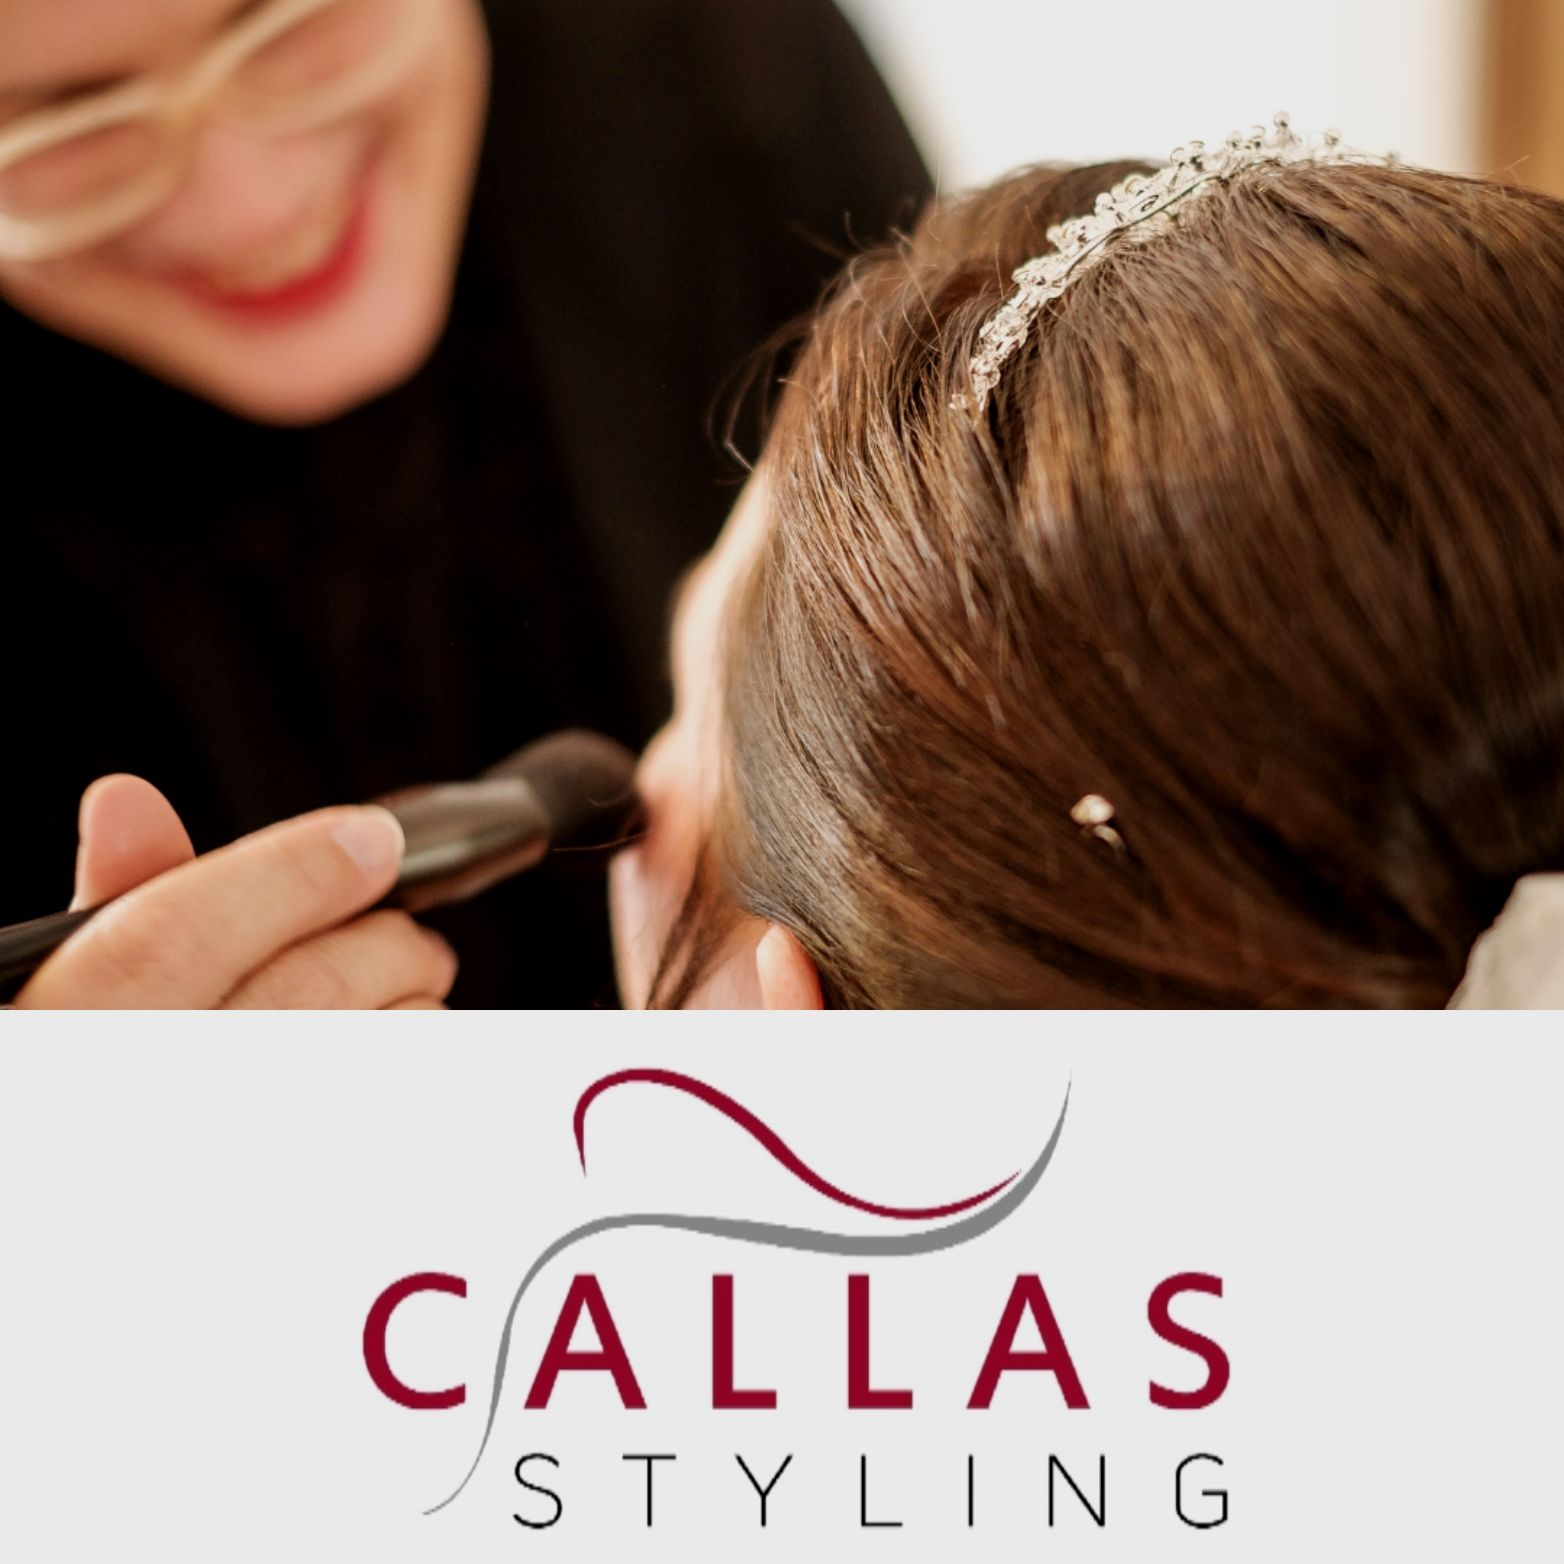 Callas Styling